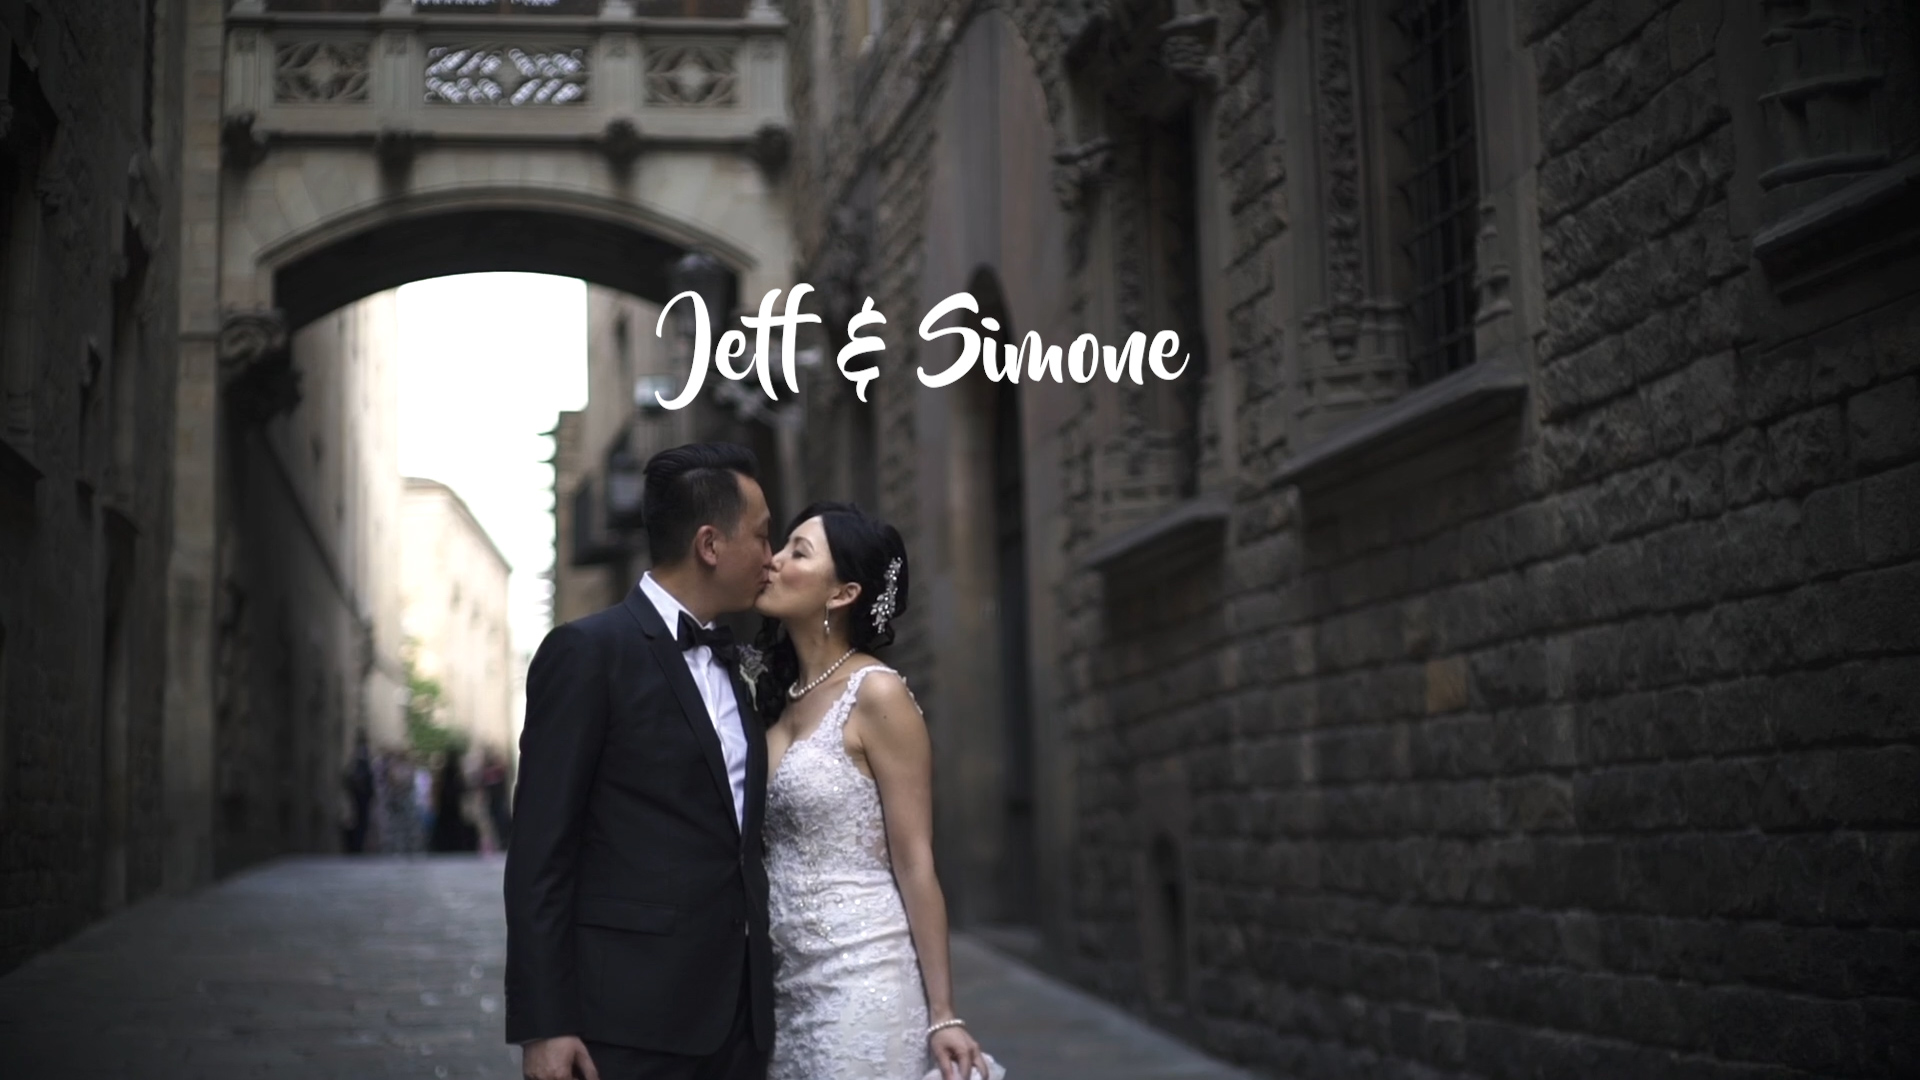 elopement video jeff&simone